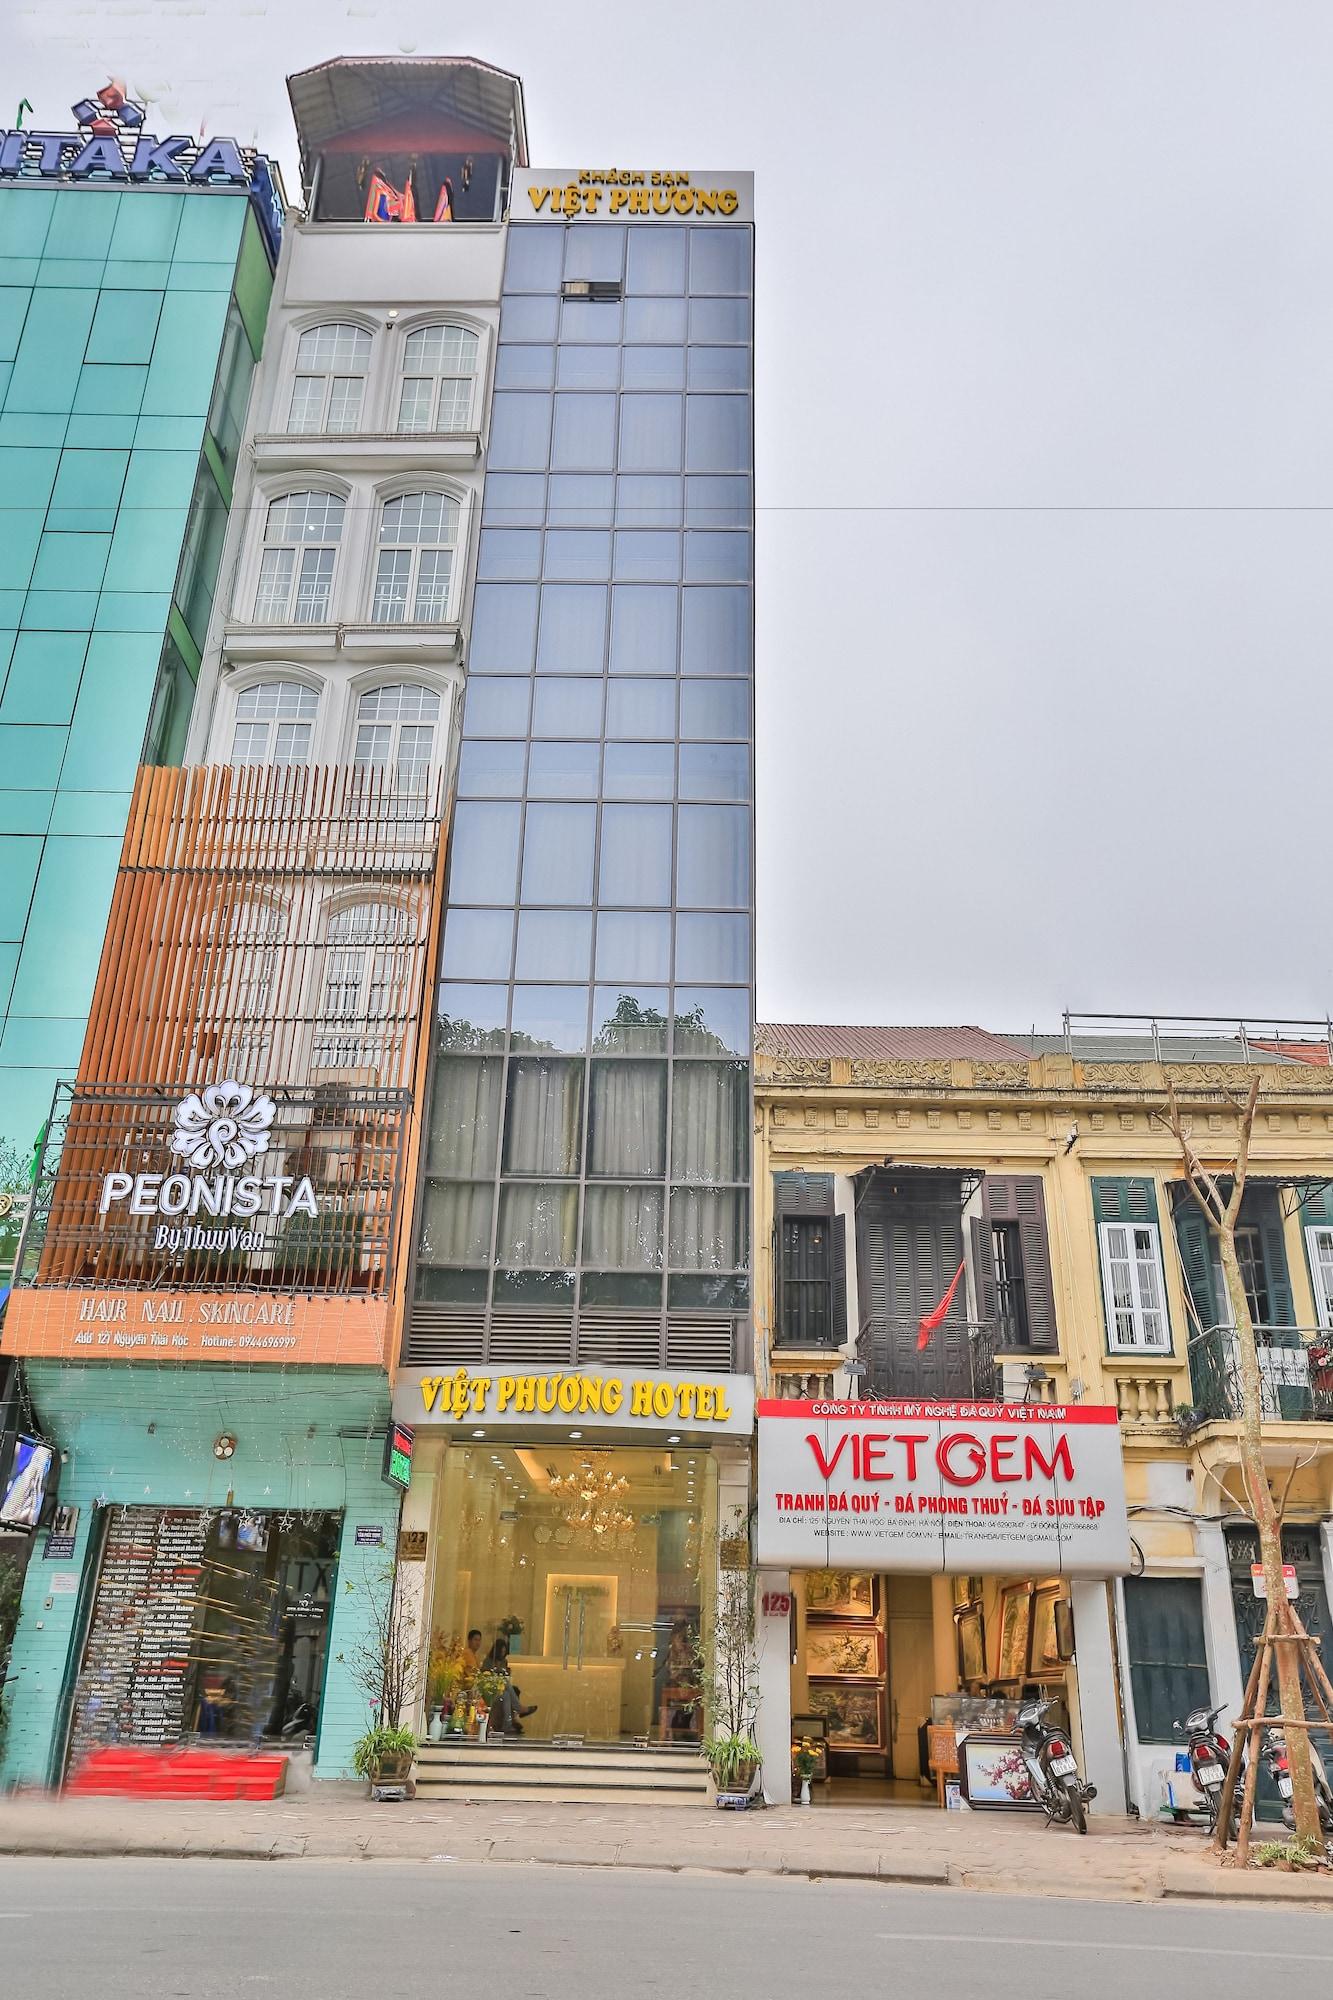 Viet Phuong hotel, Ba Đình